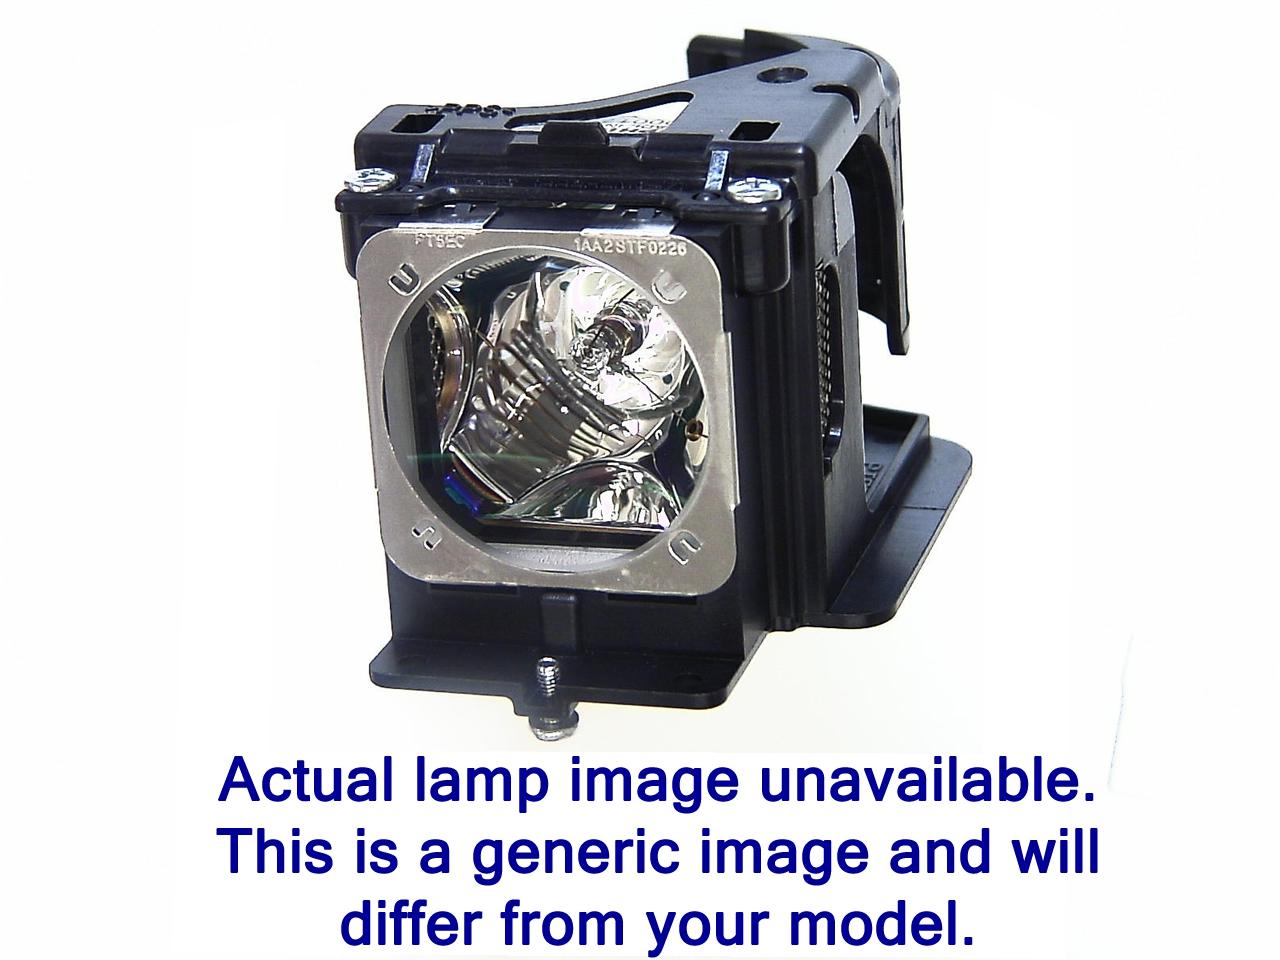 Diamond Lámpara For VIVITEK D-837 Proyector.